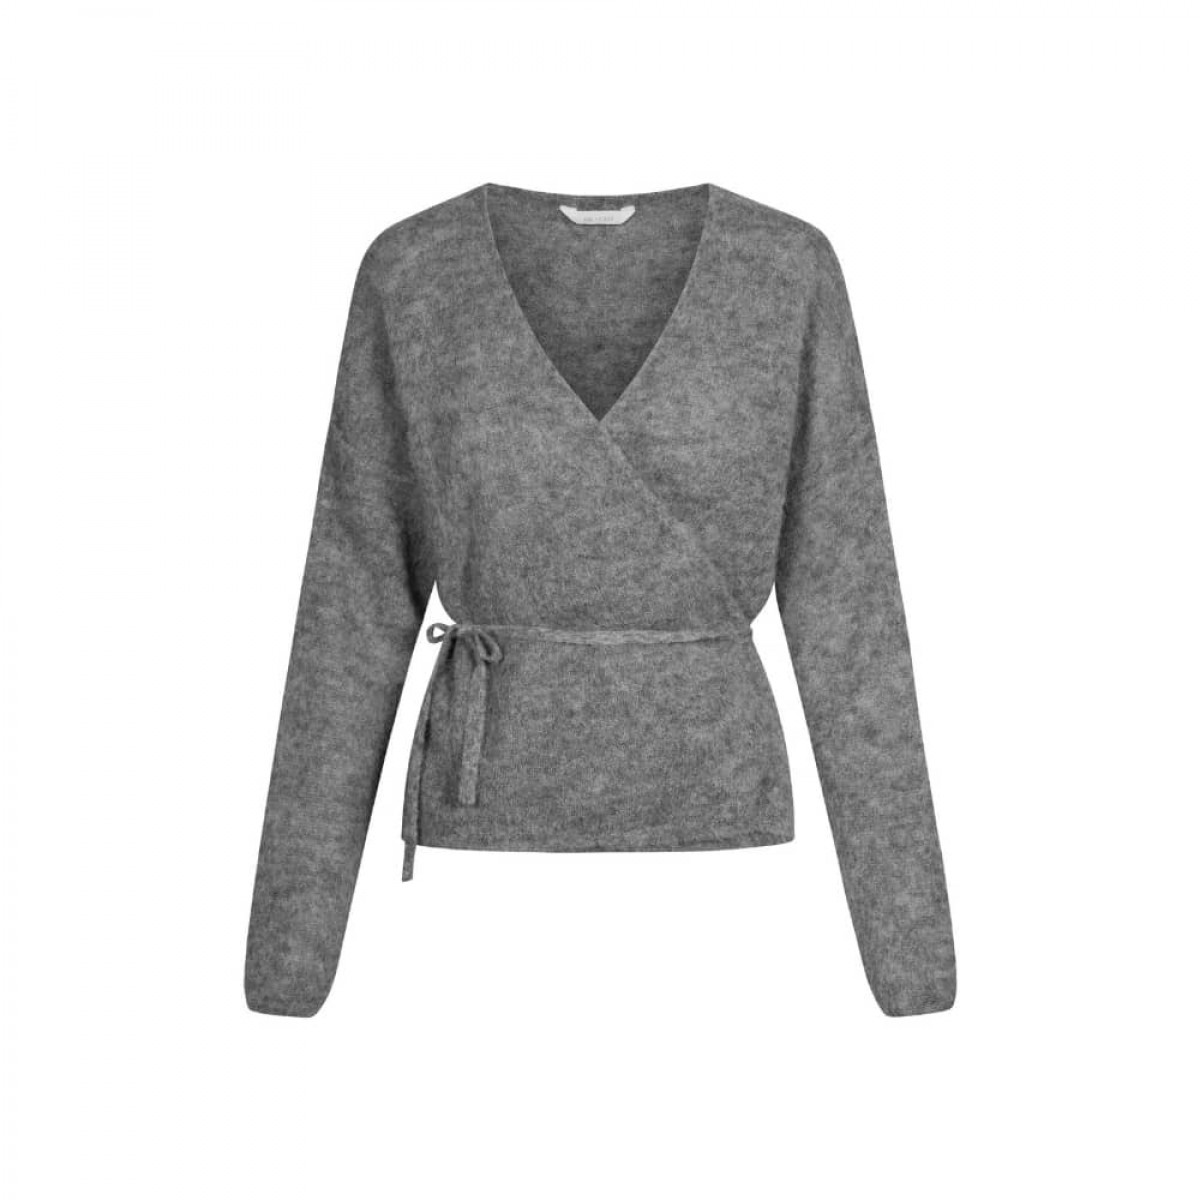 columbine cardigan - dark grey - front